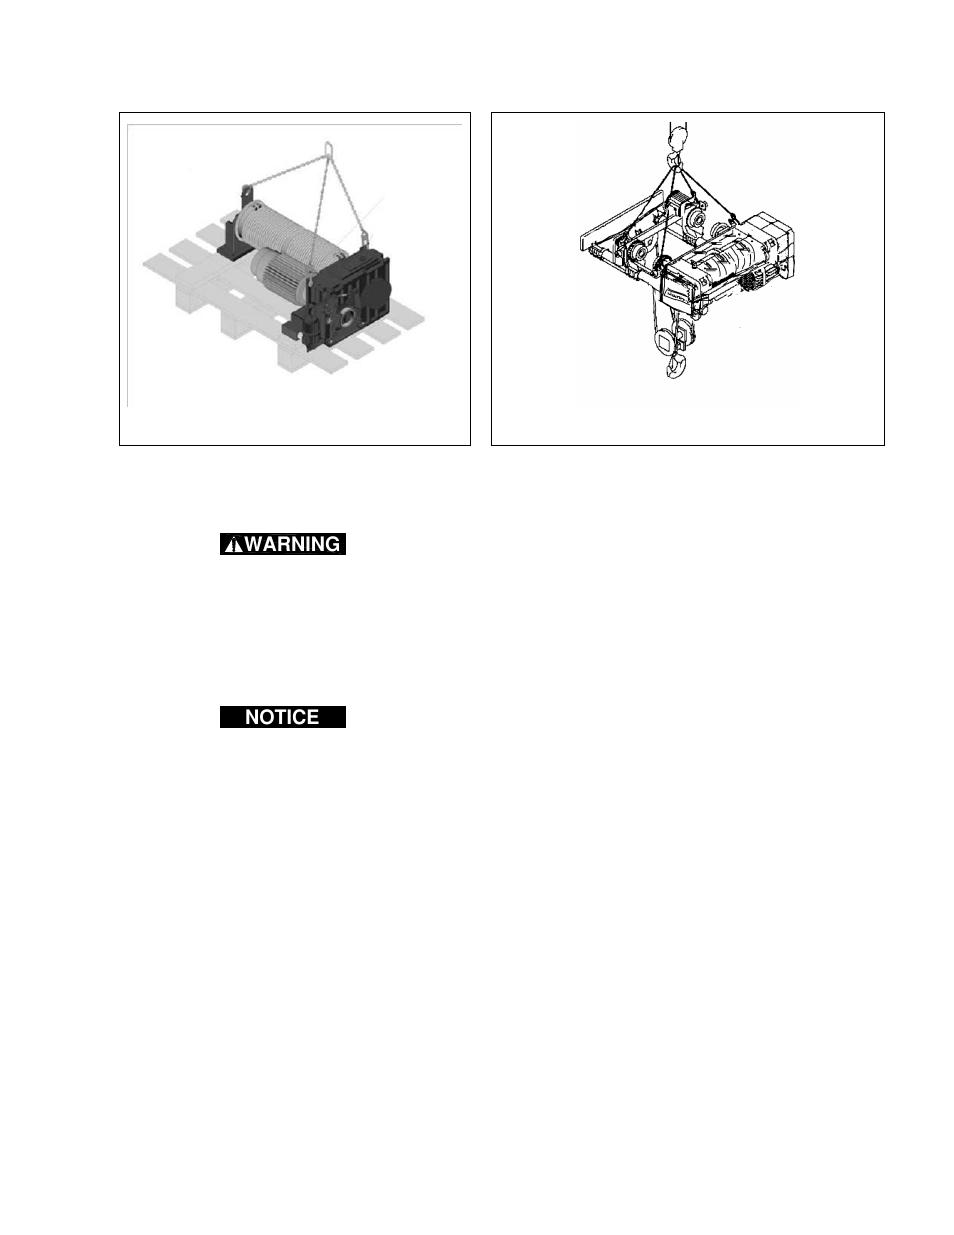 harrington hoists and cranes rhn rhino wire rope hoist user manual rh manualsdir com Rhino Mount Art Rhino Laptop Mount